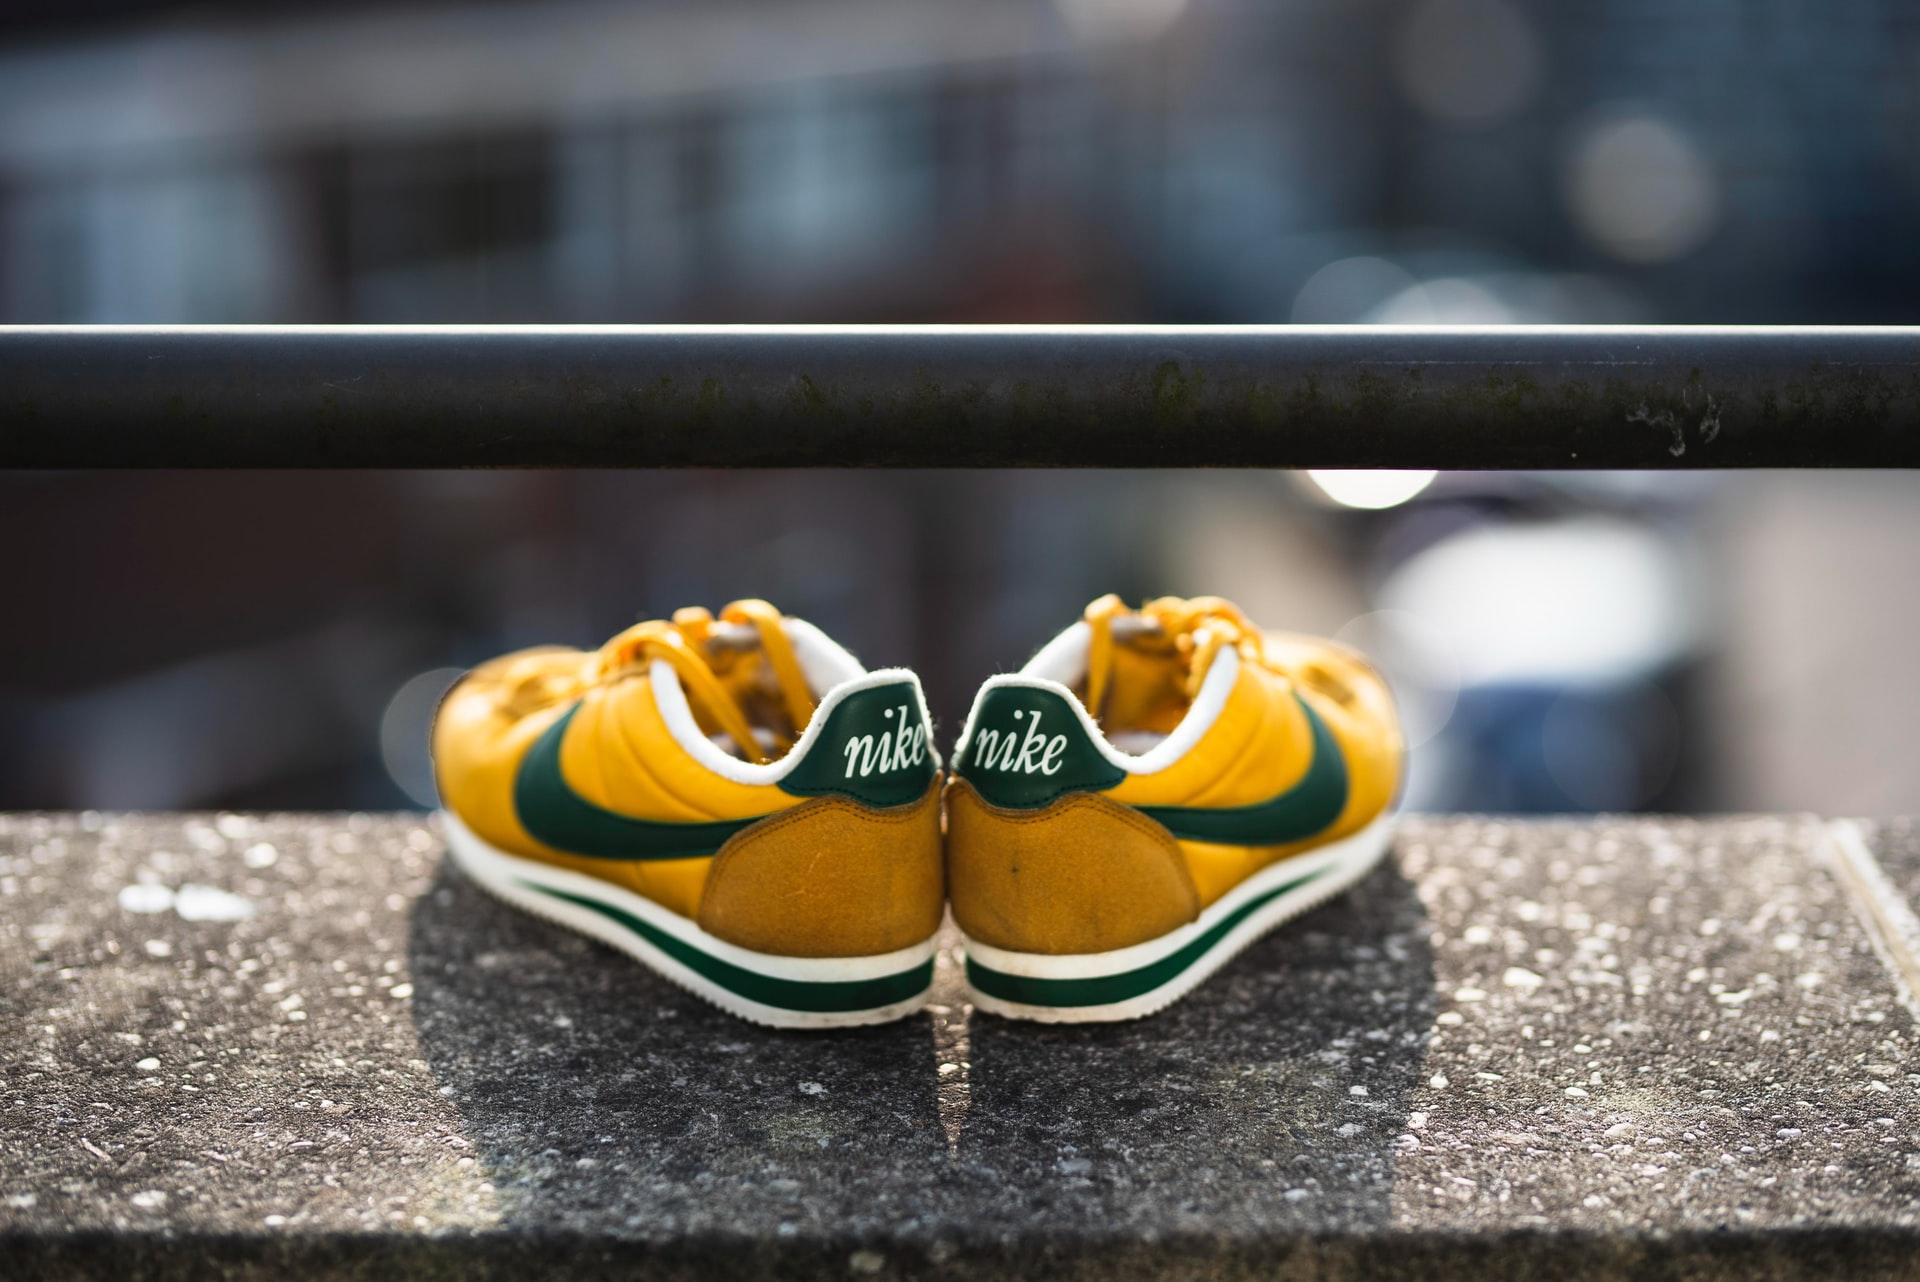 zapatillas nikes verdes